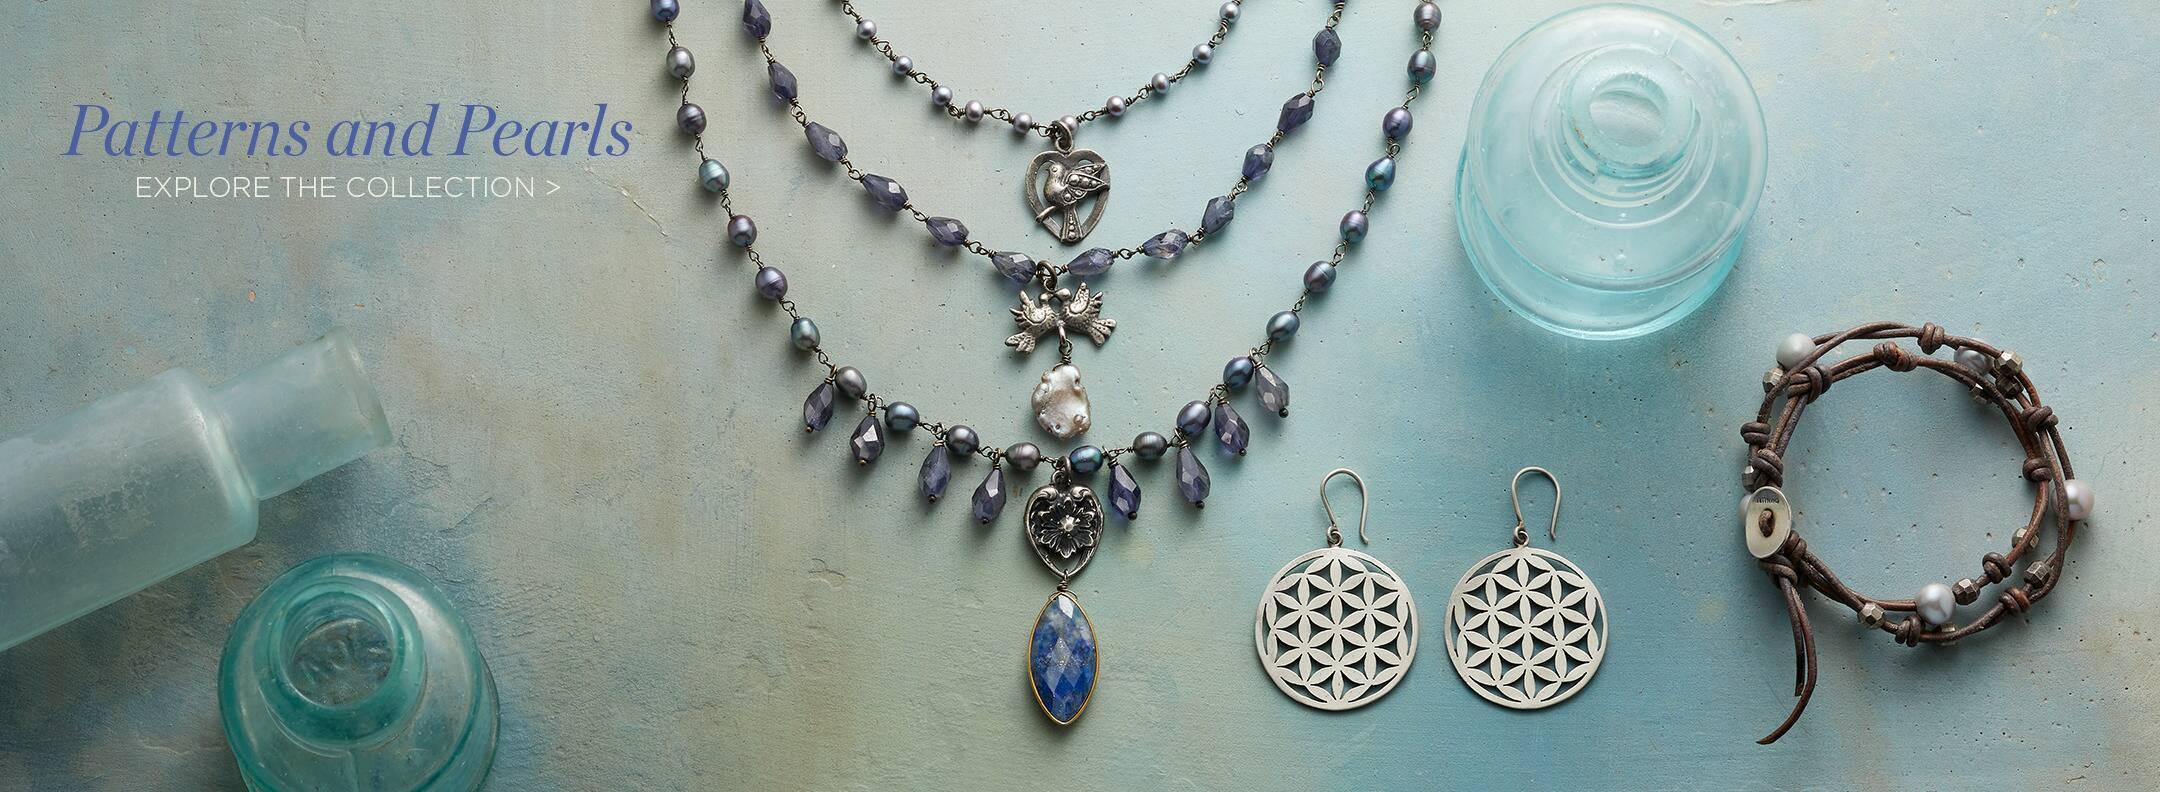 8fa391a1105 Handmade & Unique Jewelry | Robert Redford's Sundance Catalog